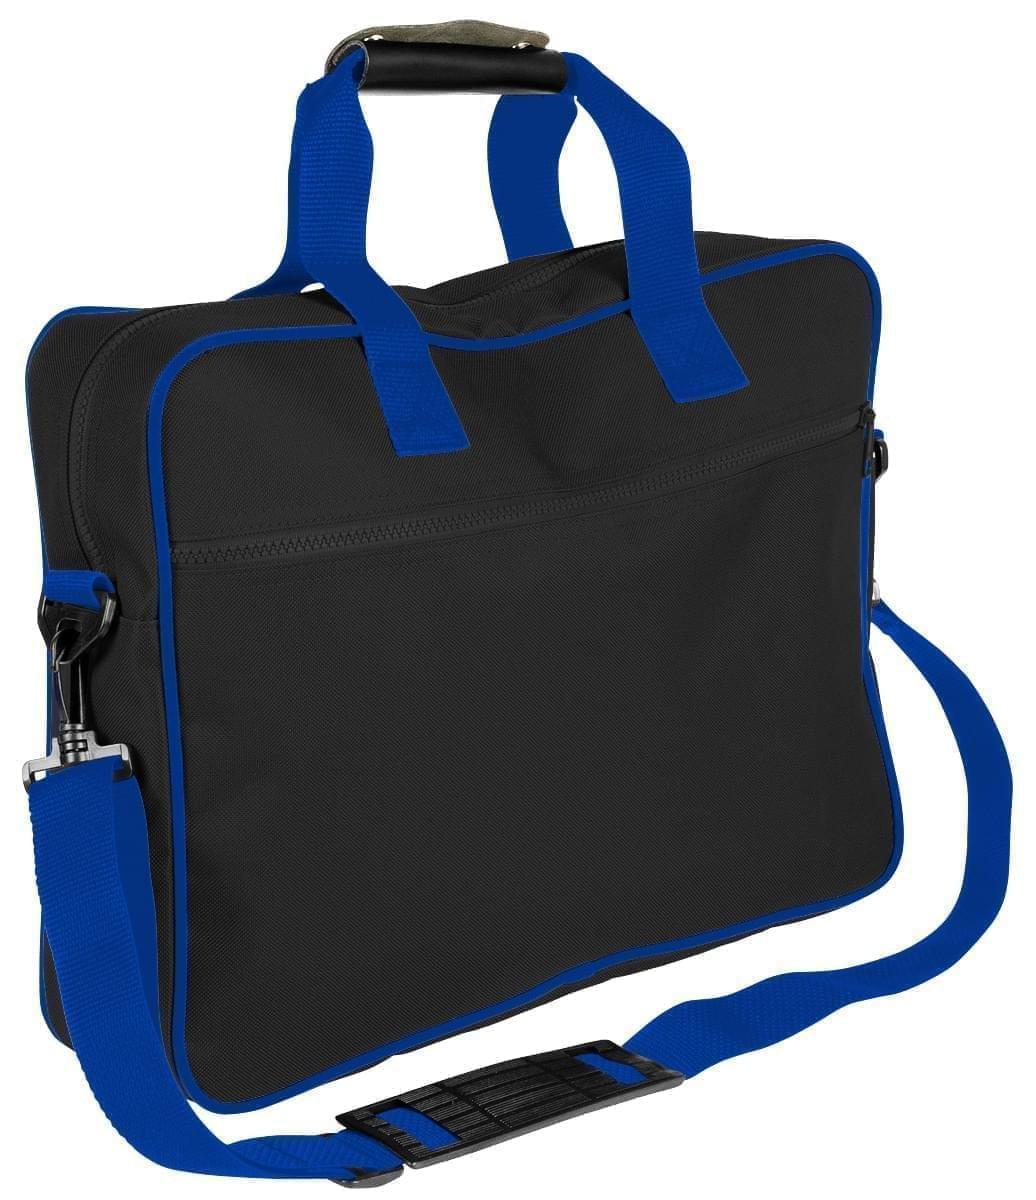 USA Made Nylon Poly Notebook Sleeves, Black-Royal Blue, CPKVA59PO3